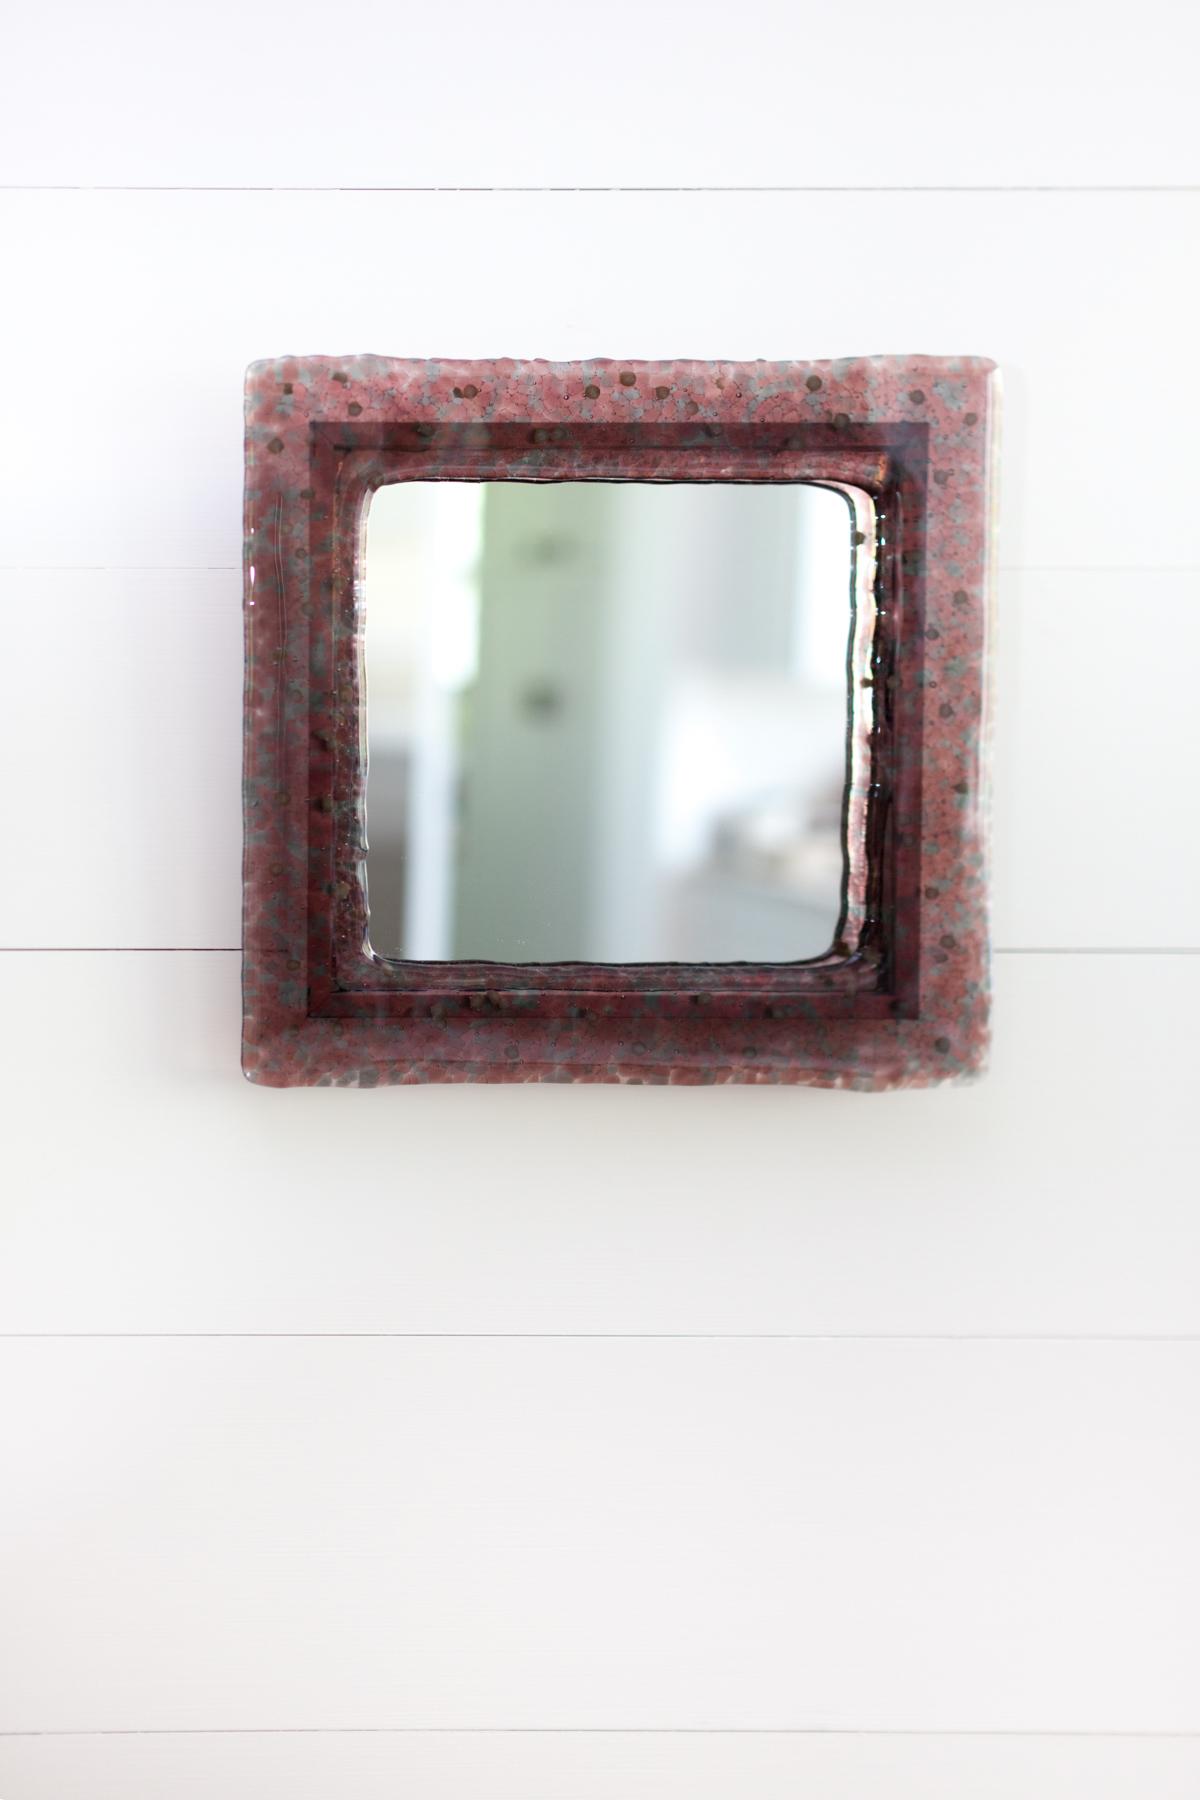 Custom mirror installed in customer's home